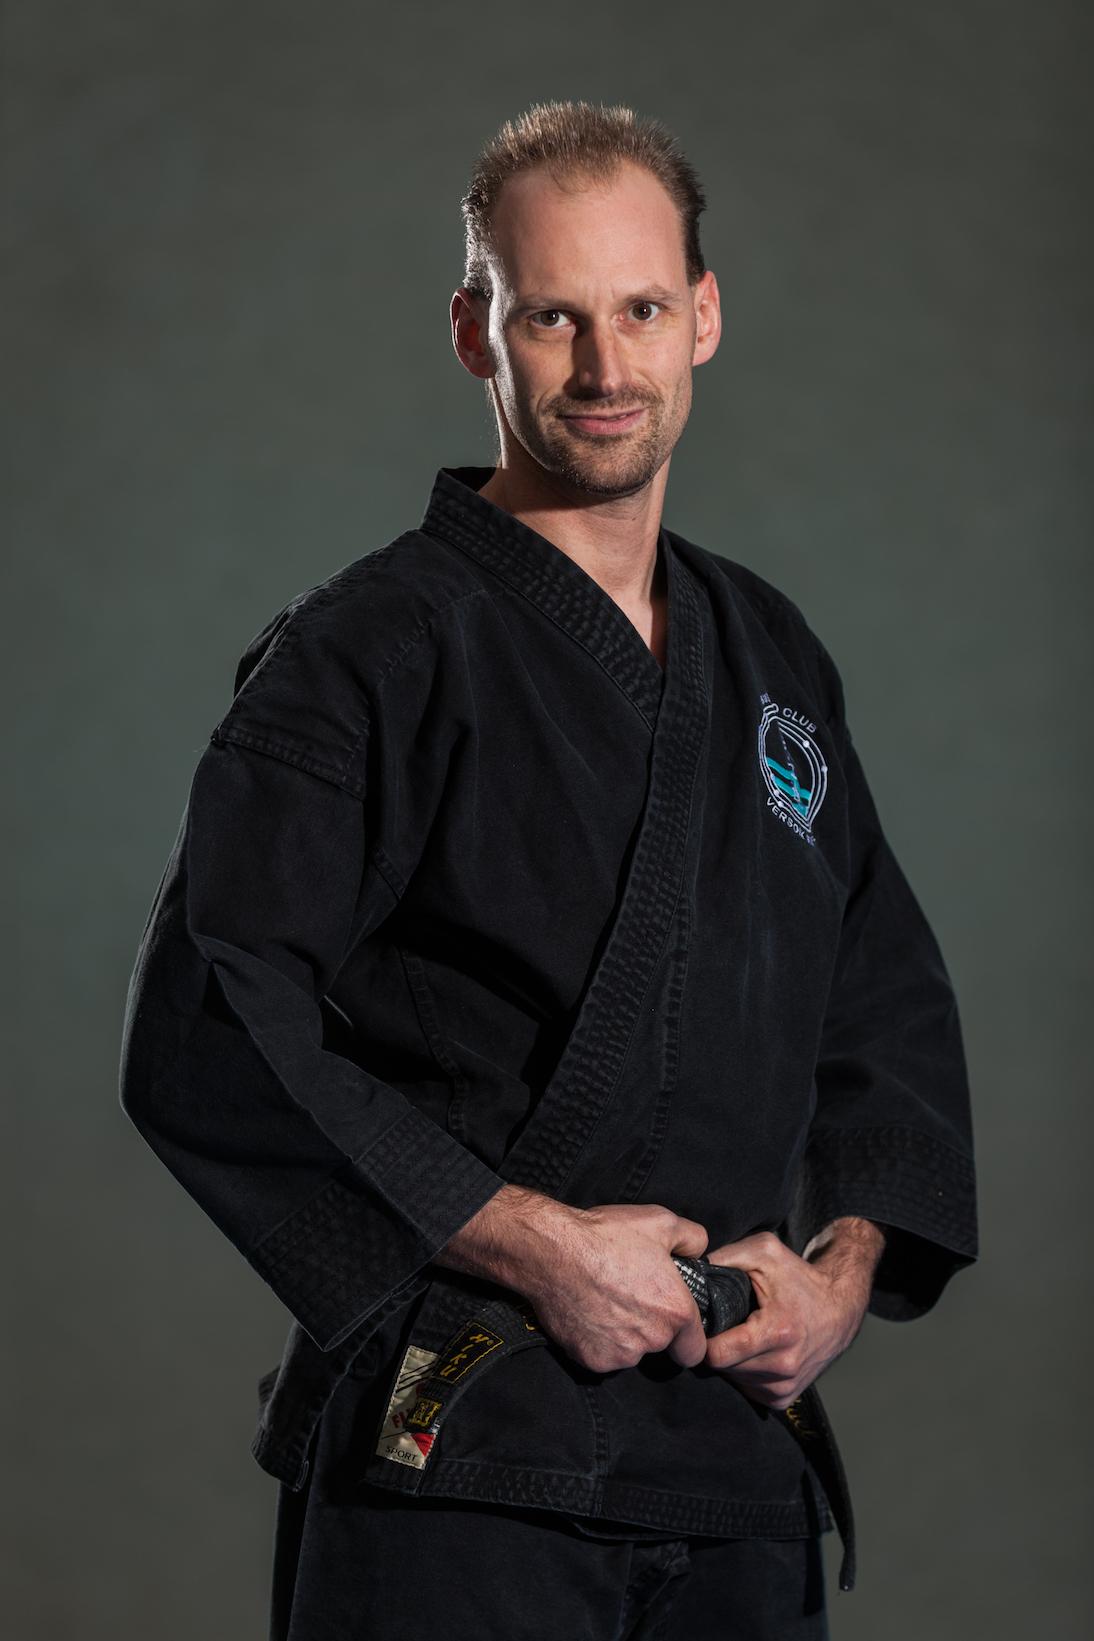 Michael Müller